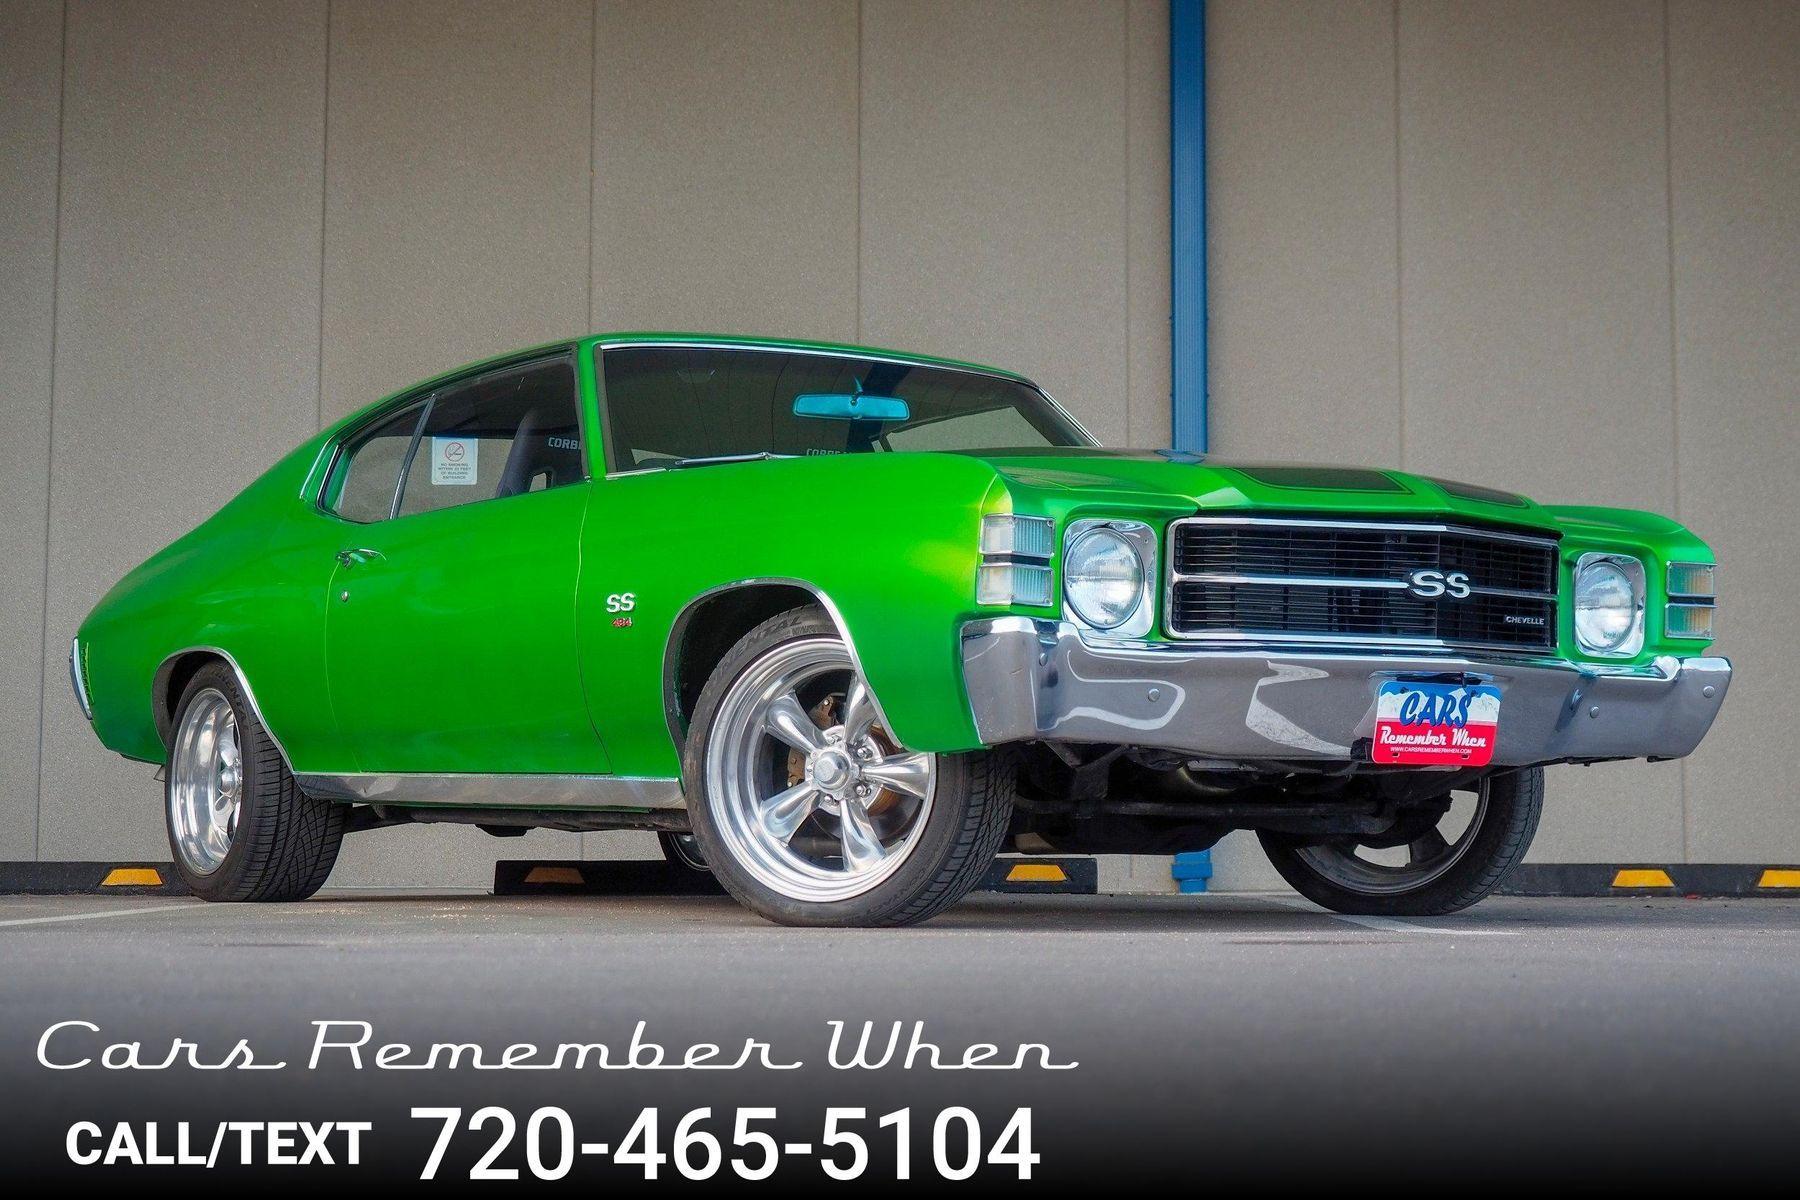 1971 Chevrolet Chevelle American Muscle Machine For Sale Allcollectorcars Com Chevrolet Chevelle Chevelle Chevrolet